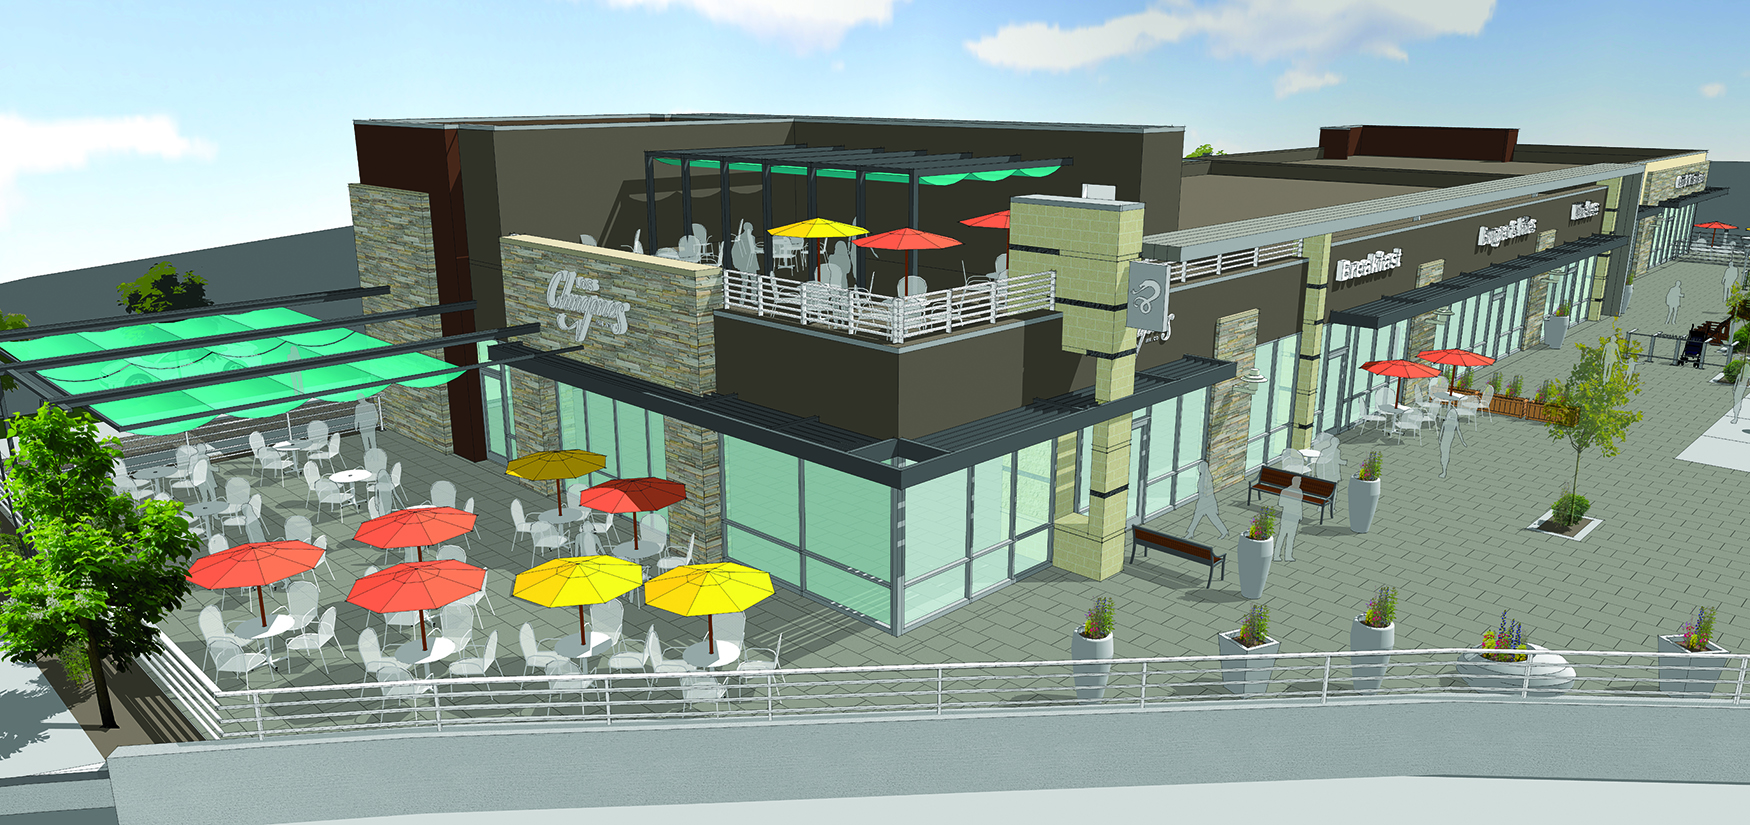 EastBridge Town Center Rendering